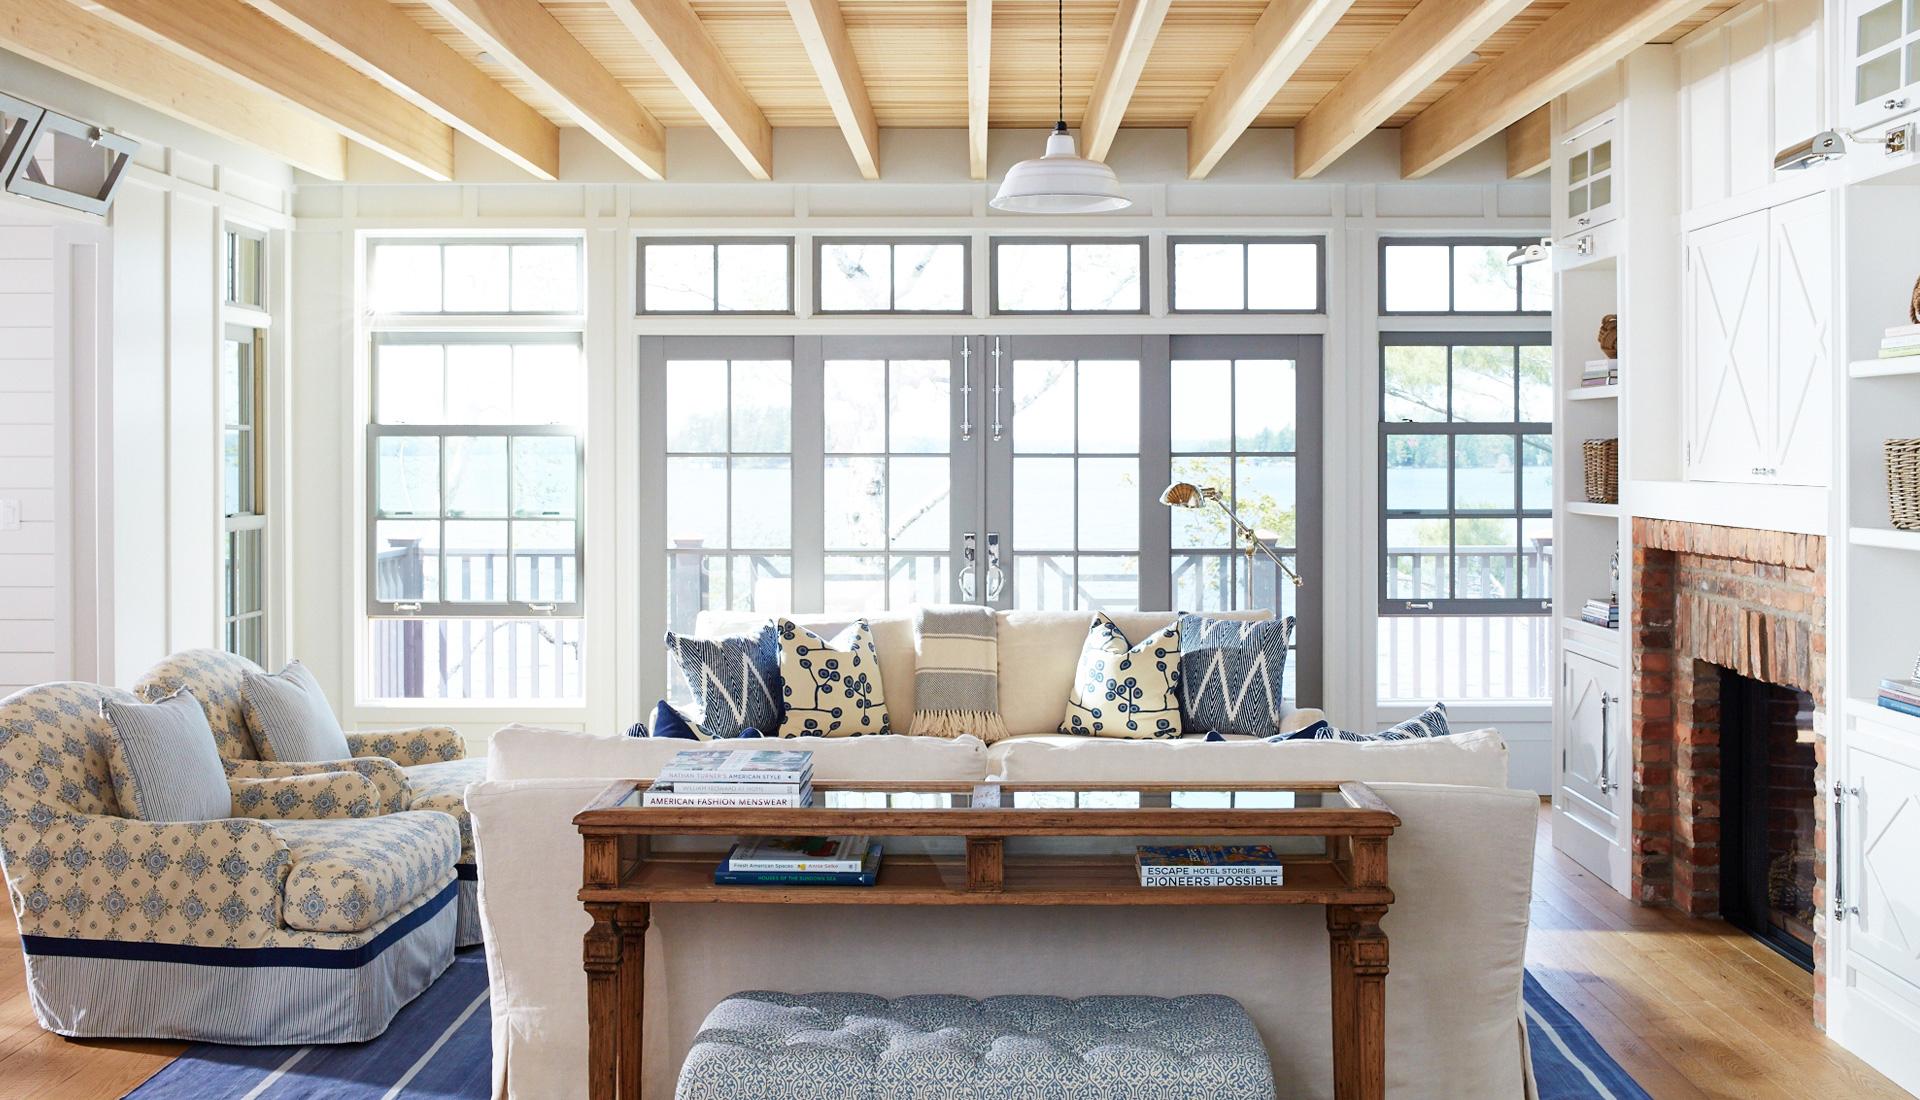 Coastal Interiors Design Styles. Coastal Decorating Ideas Beach Home Decor